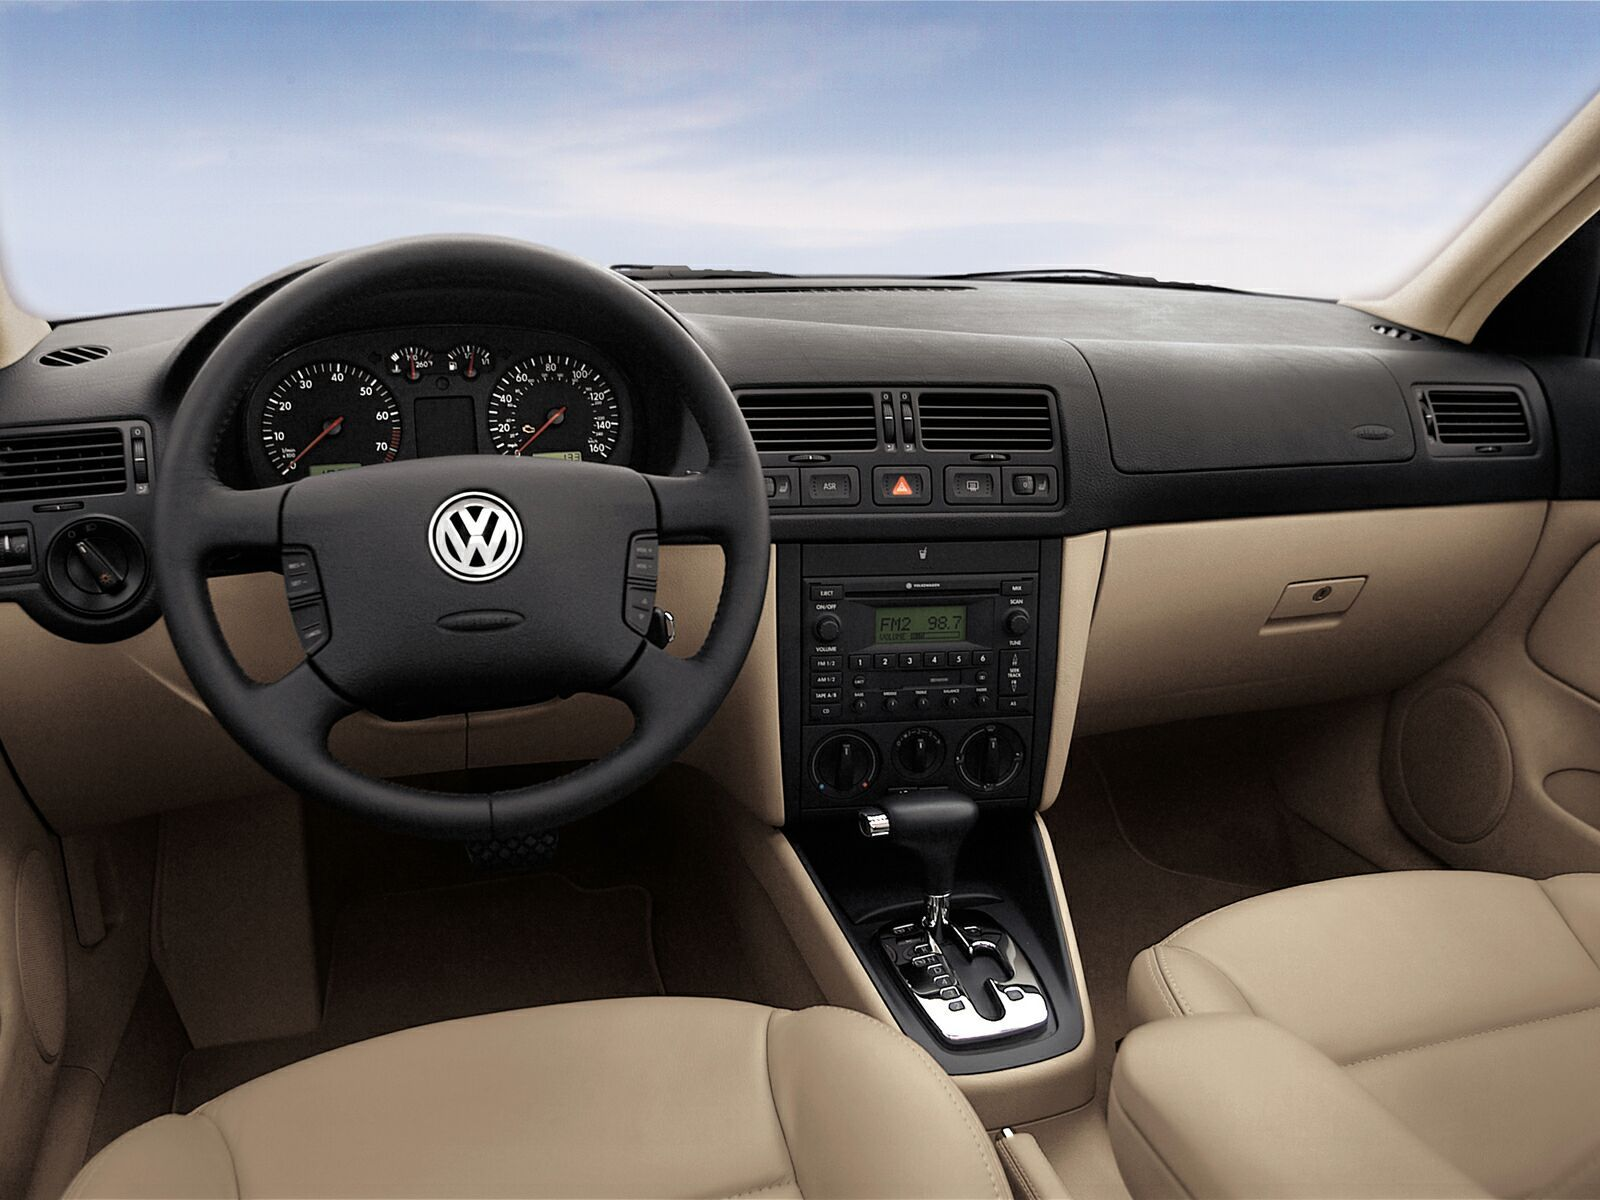 http://4.bp.blogspot.com/-owY3oFVp6q0/TluyTjLPUcI/AAAAAAAAAJU/g4__EM0Yk4k/s1600/Volkswagen-Jetta6.jpg